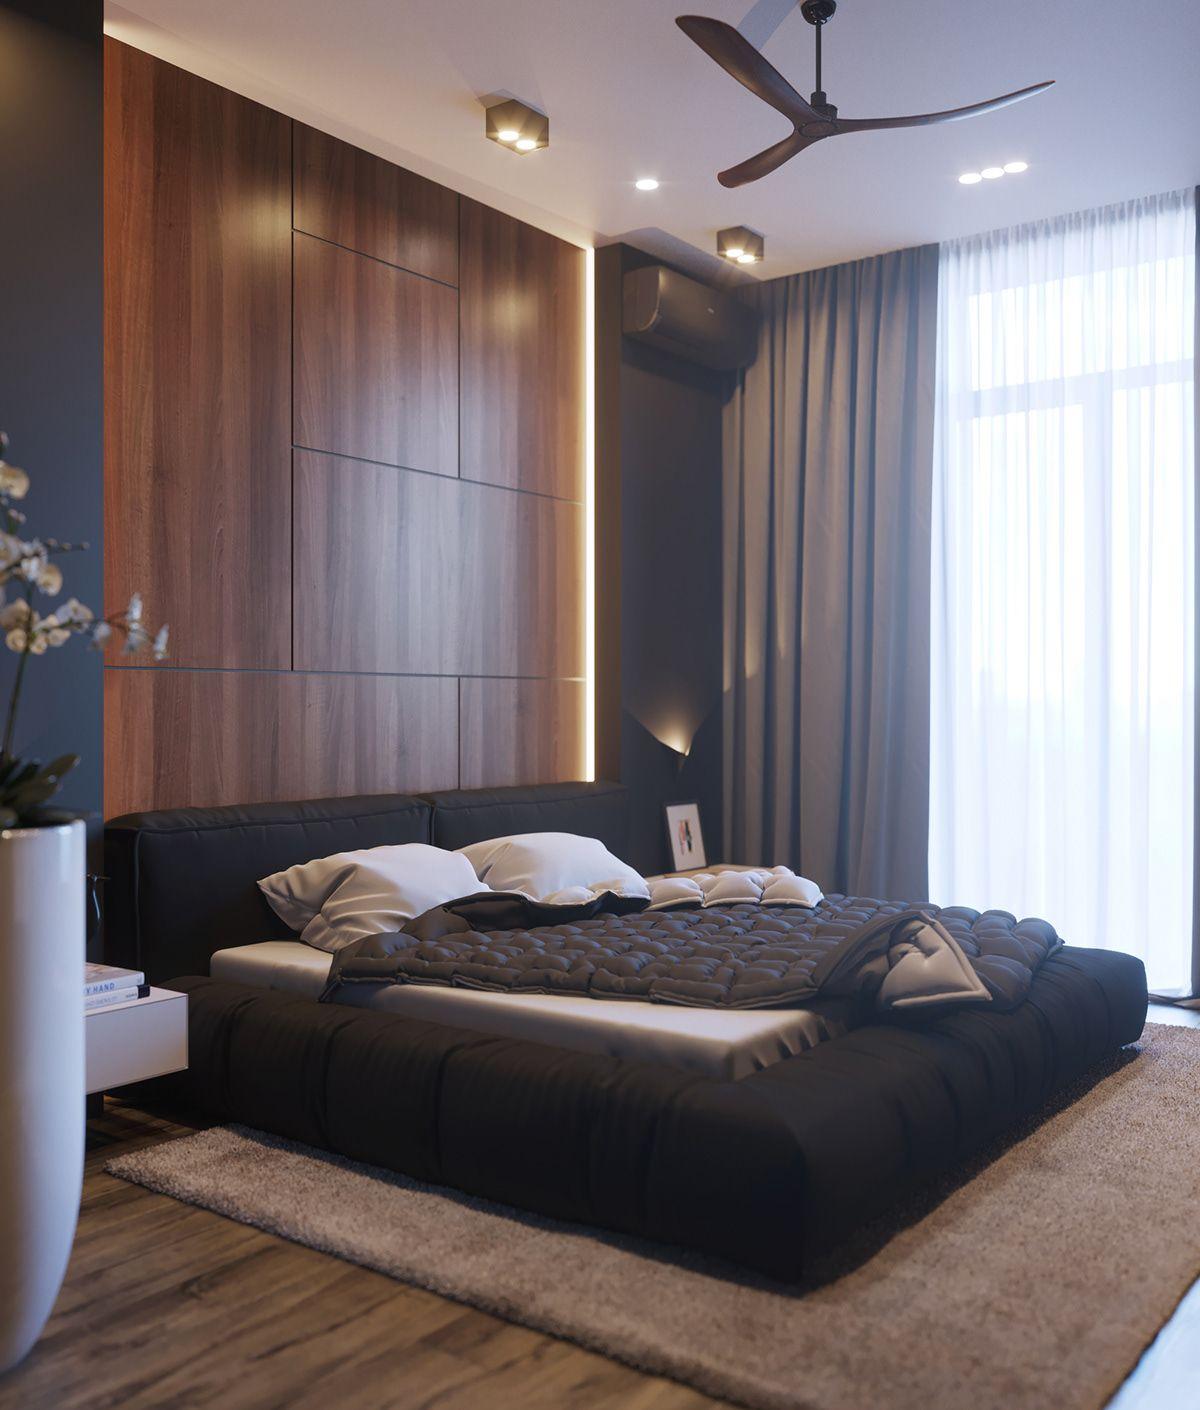 Blanc Residence On Behance Luxurious Bedrooms Luxury Bedroom